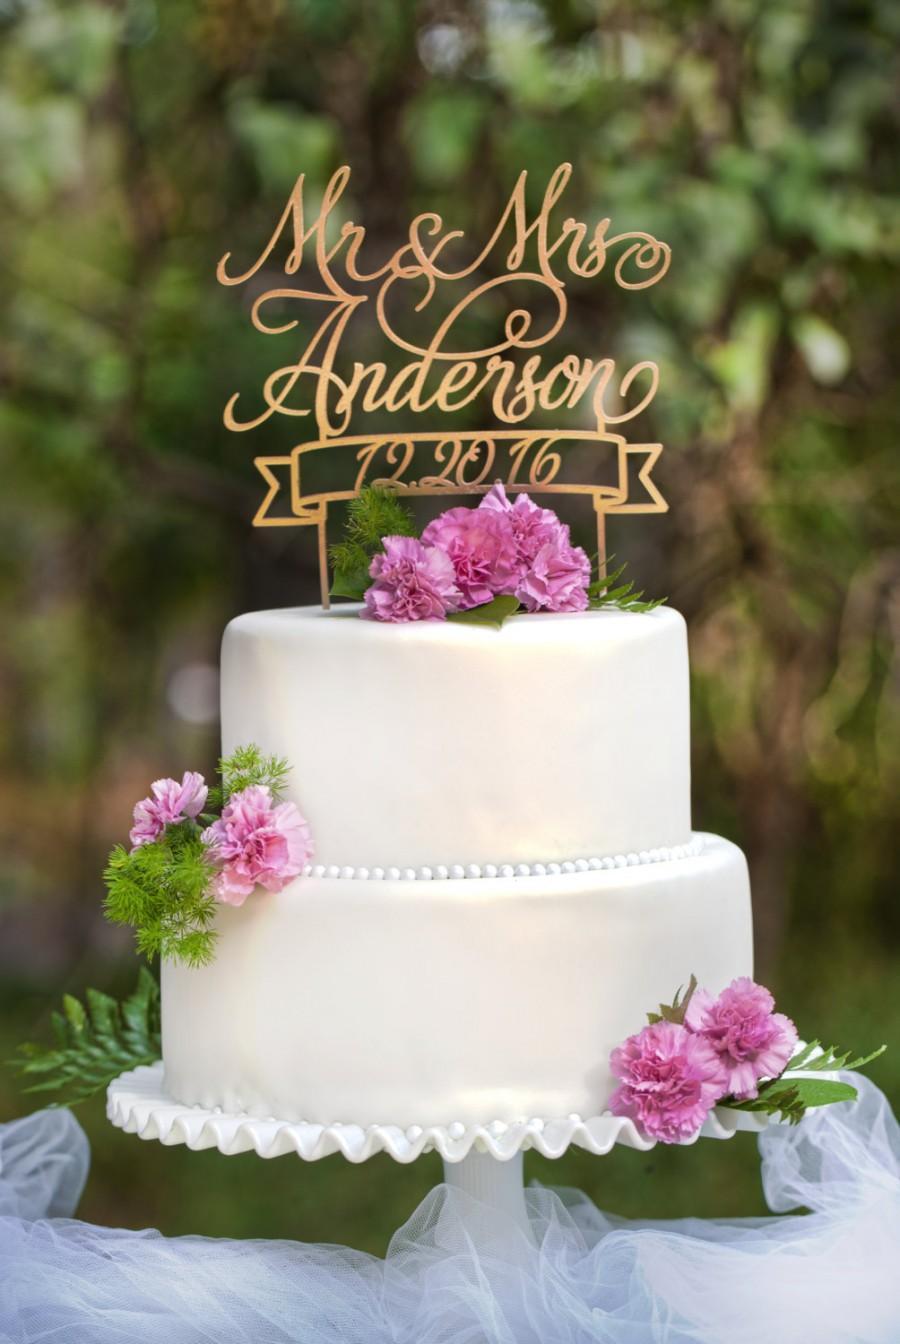 Mariage - Mr & Mrs Custom Name and Date Wedding Cake Topper